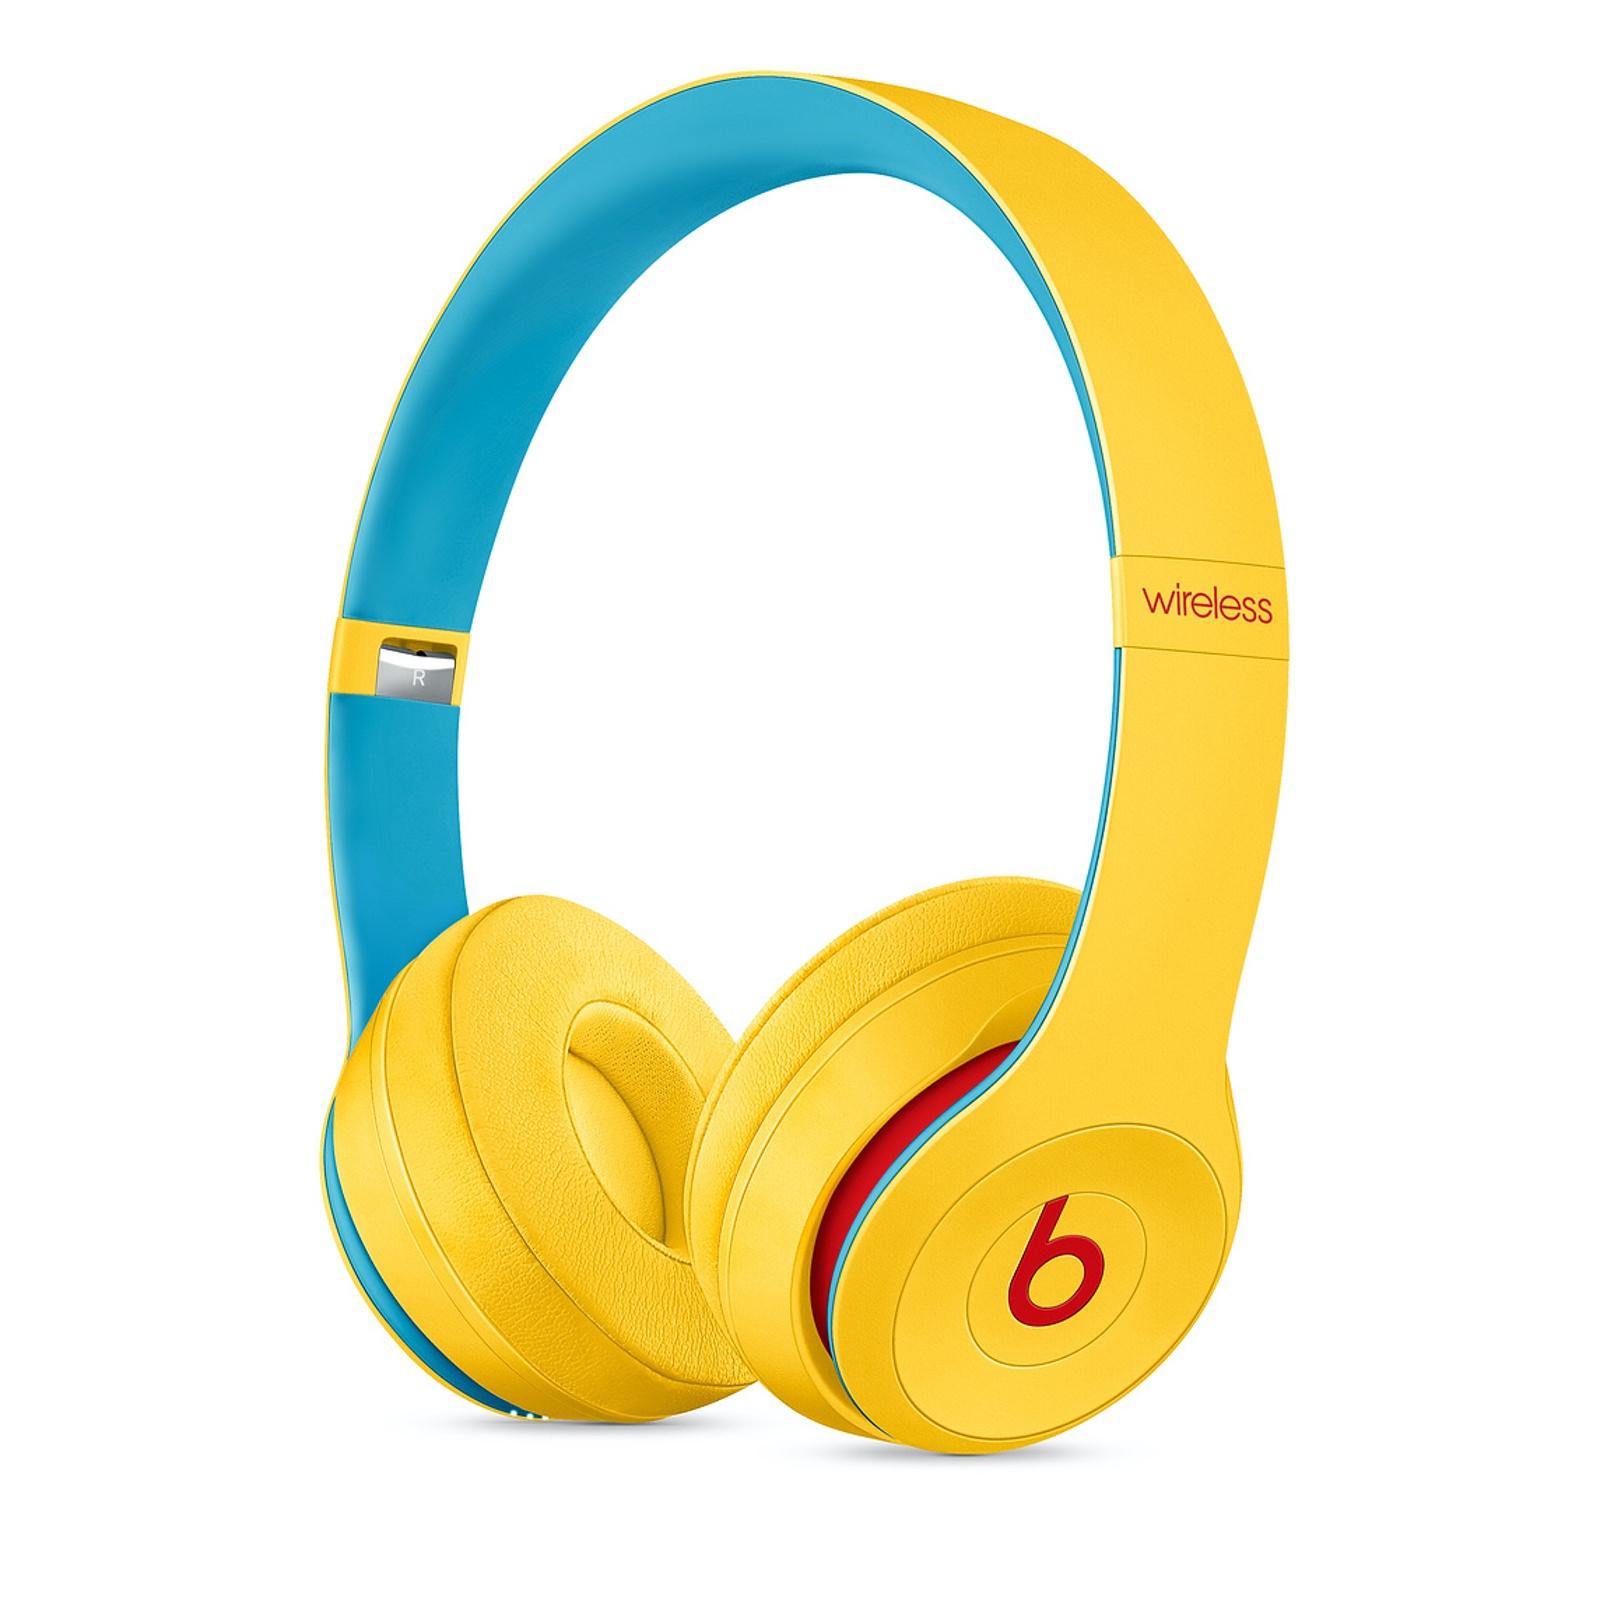 Beats-Solo3-Wireless-Beats-Club-Collection-03.jpeg